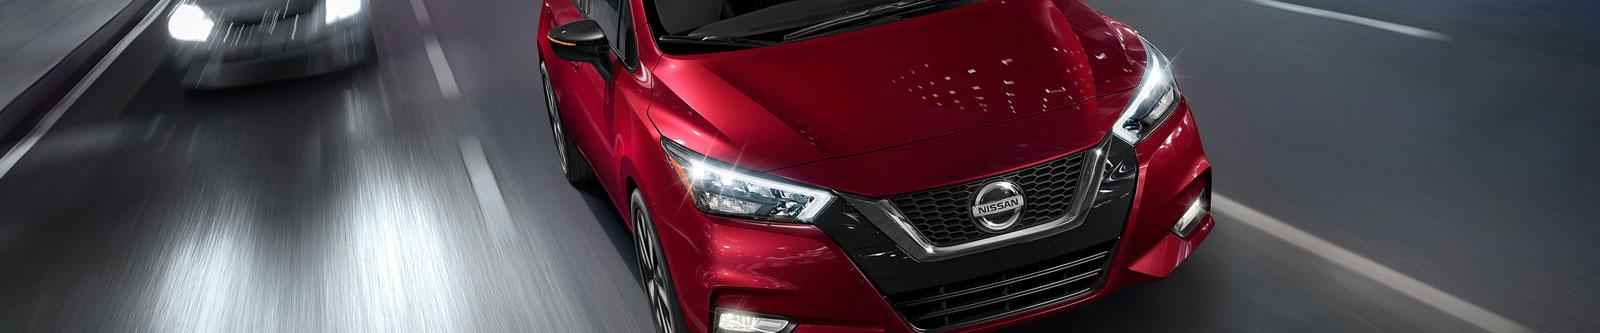 Estabrook Nissan Proudly Serves Biloxi, Mississippi, Motorists